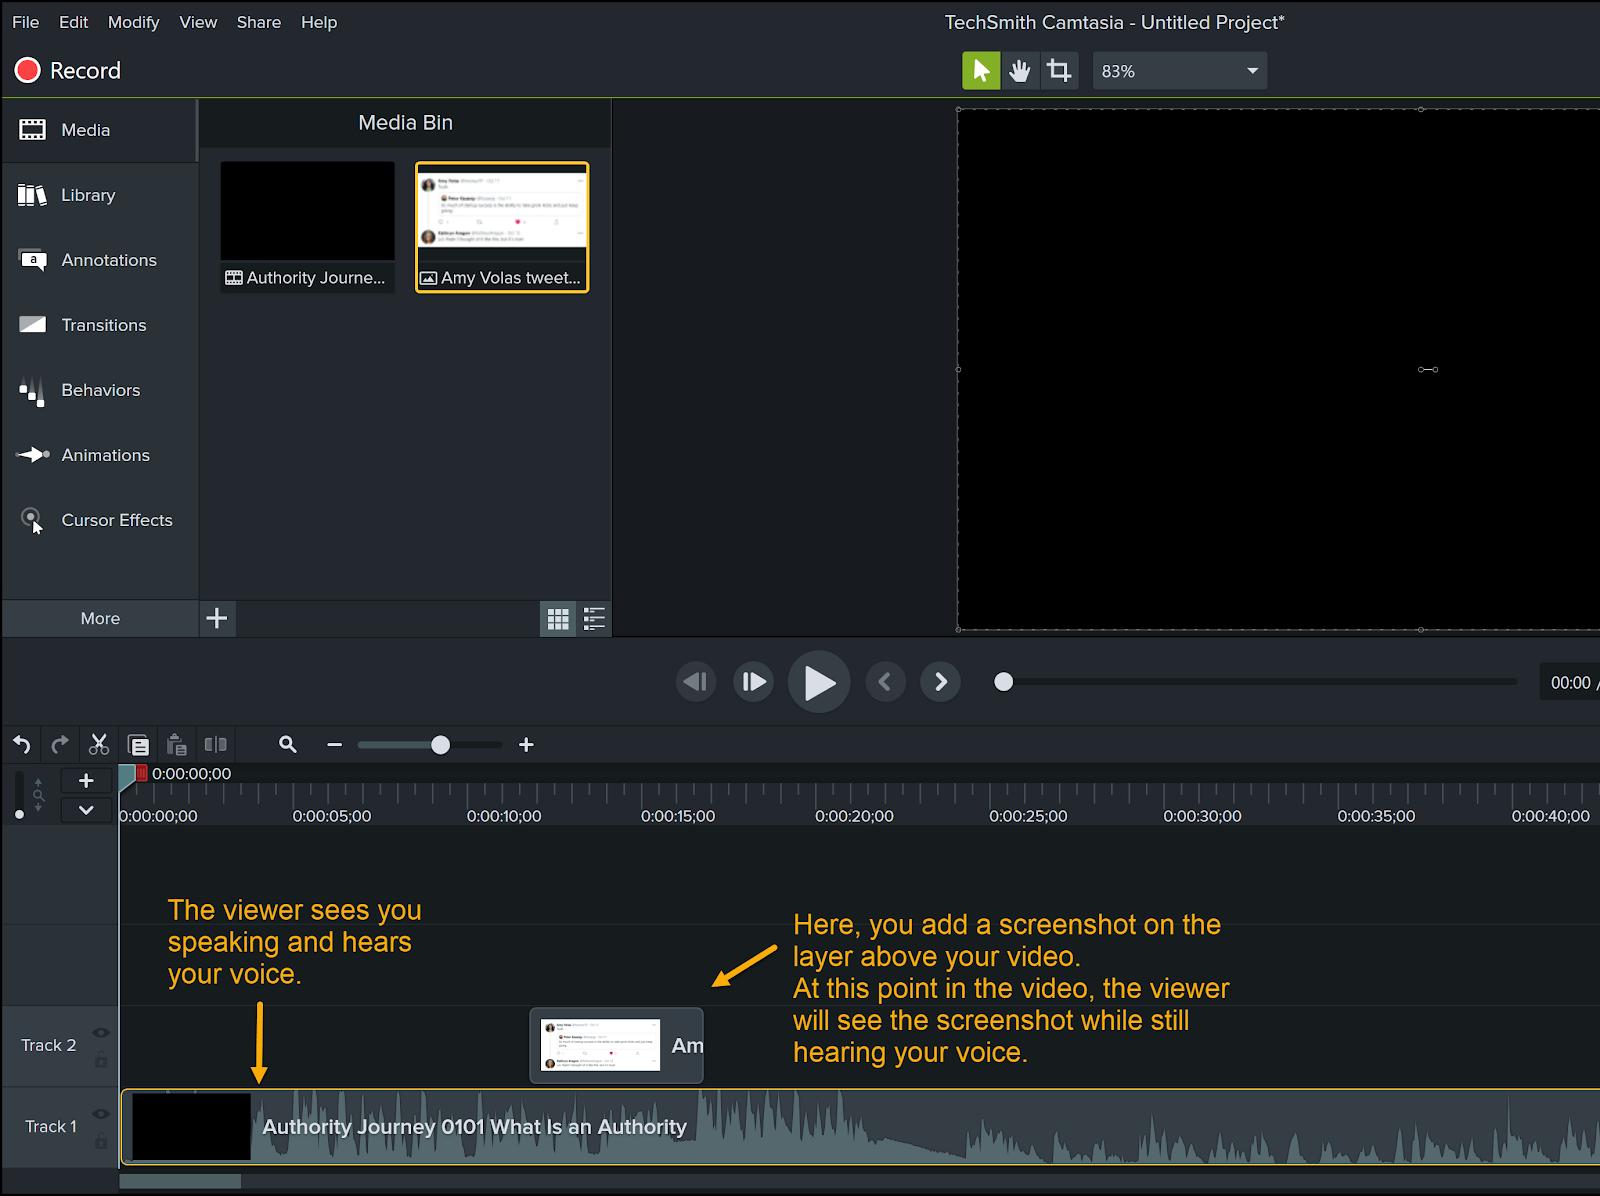 Screenshot of Camtasia software